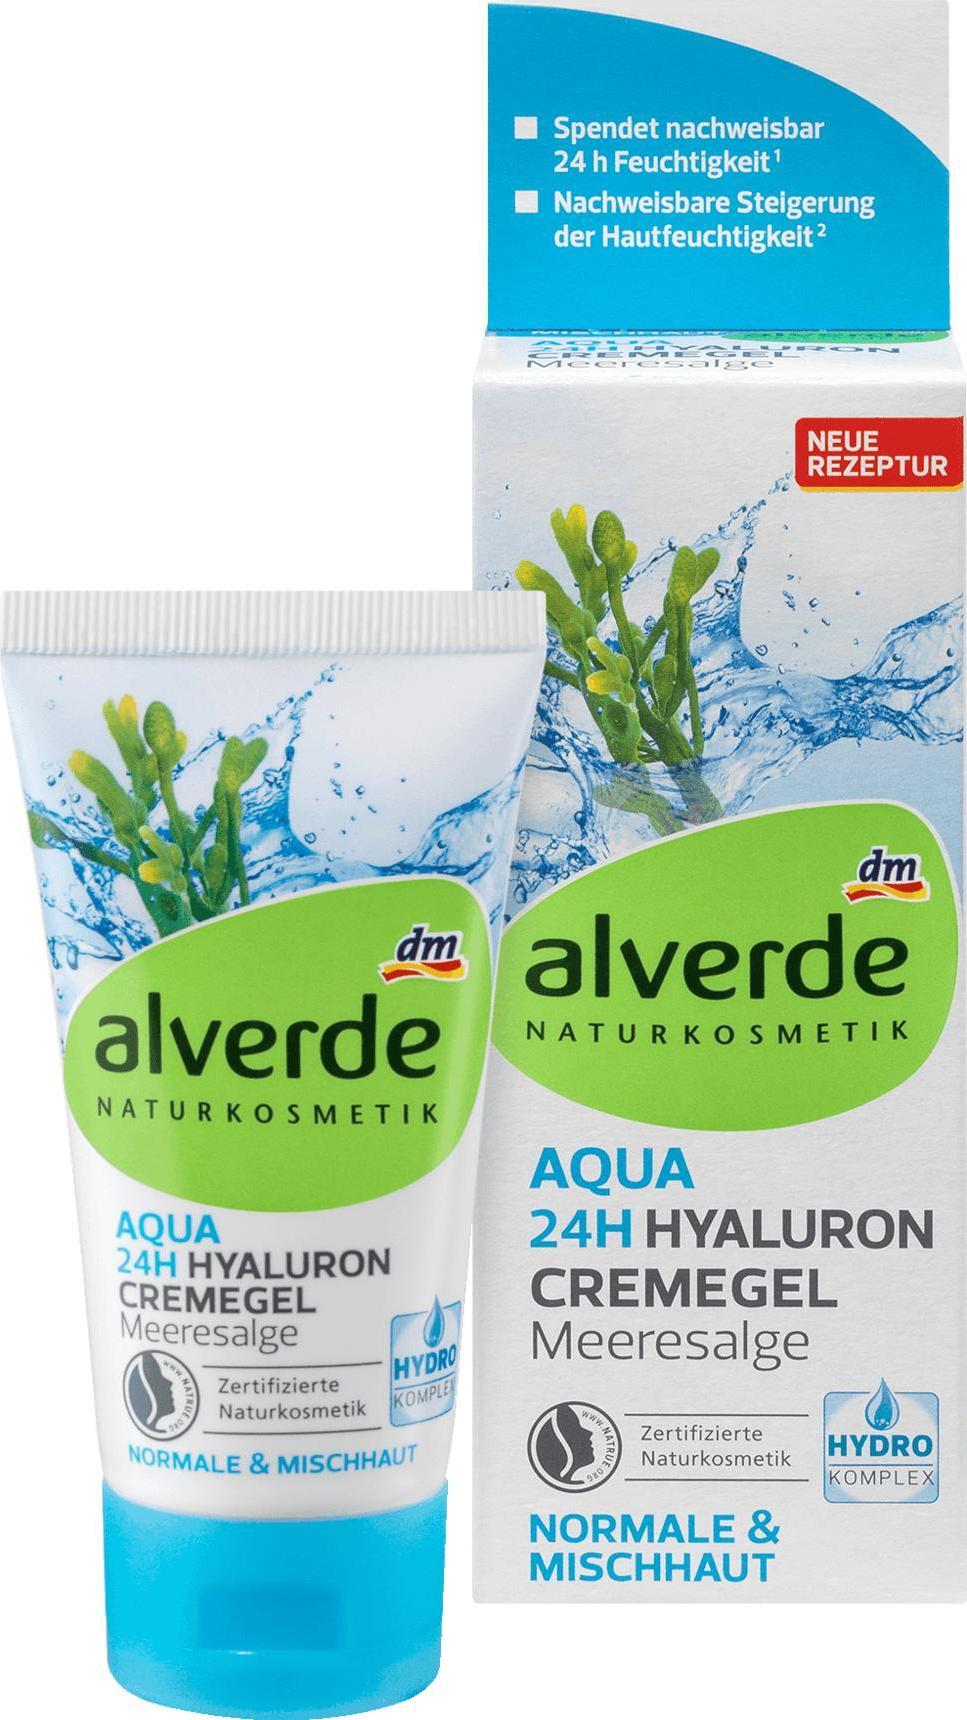 Отзыв на Tagespflege Aqua 24h Hyaluron Hydro Cremegel Meeresalge, 50 ml из Интернет-Магазина DM